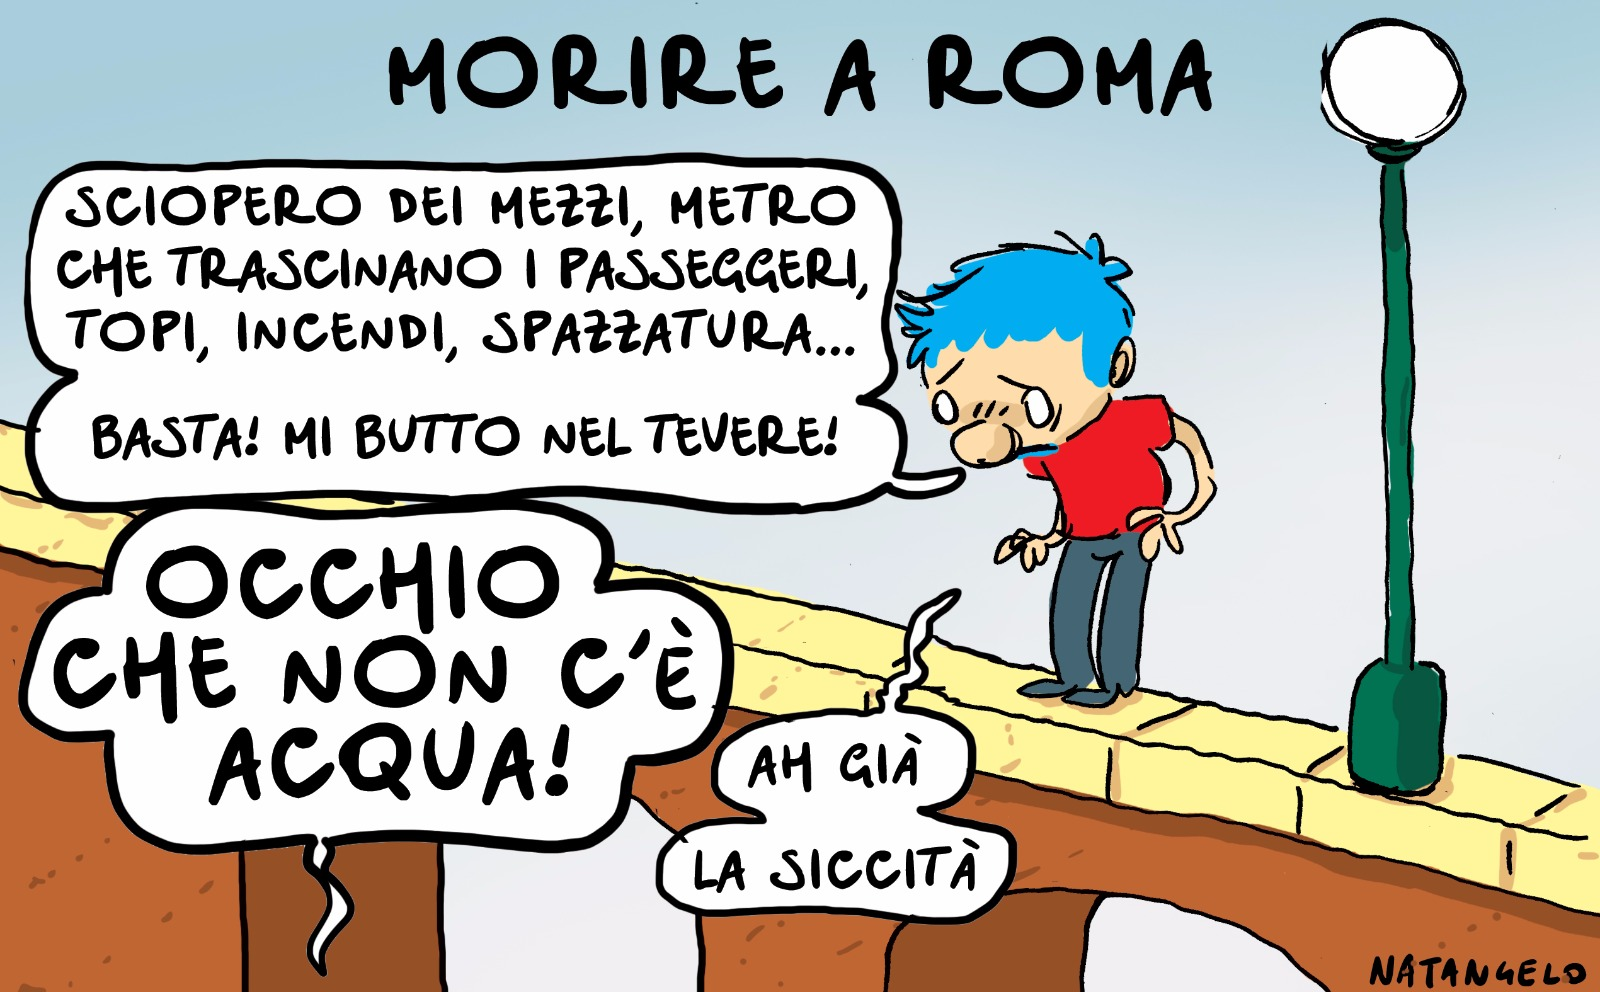 Morire a Roma